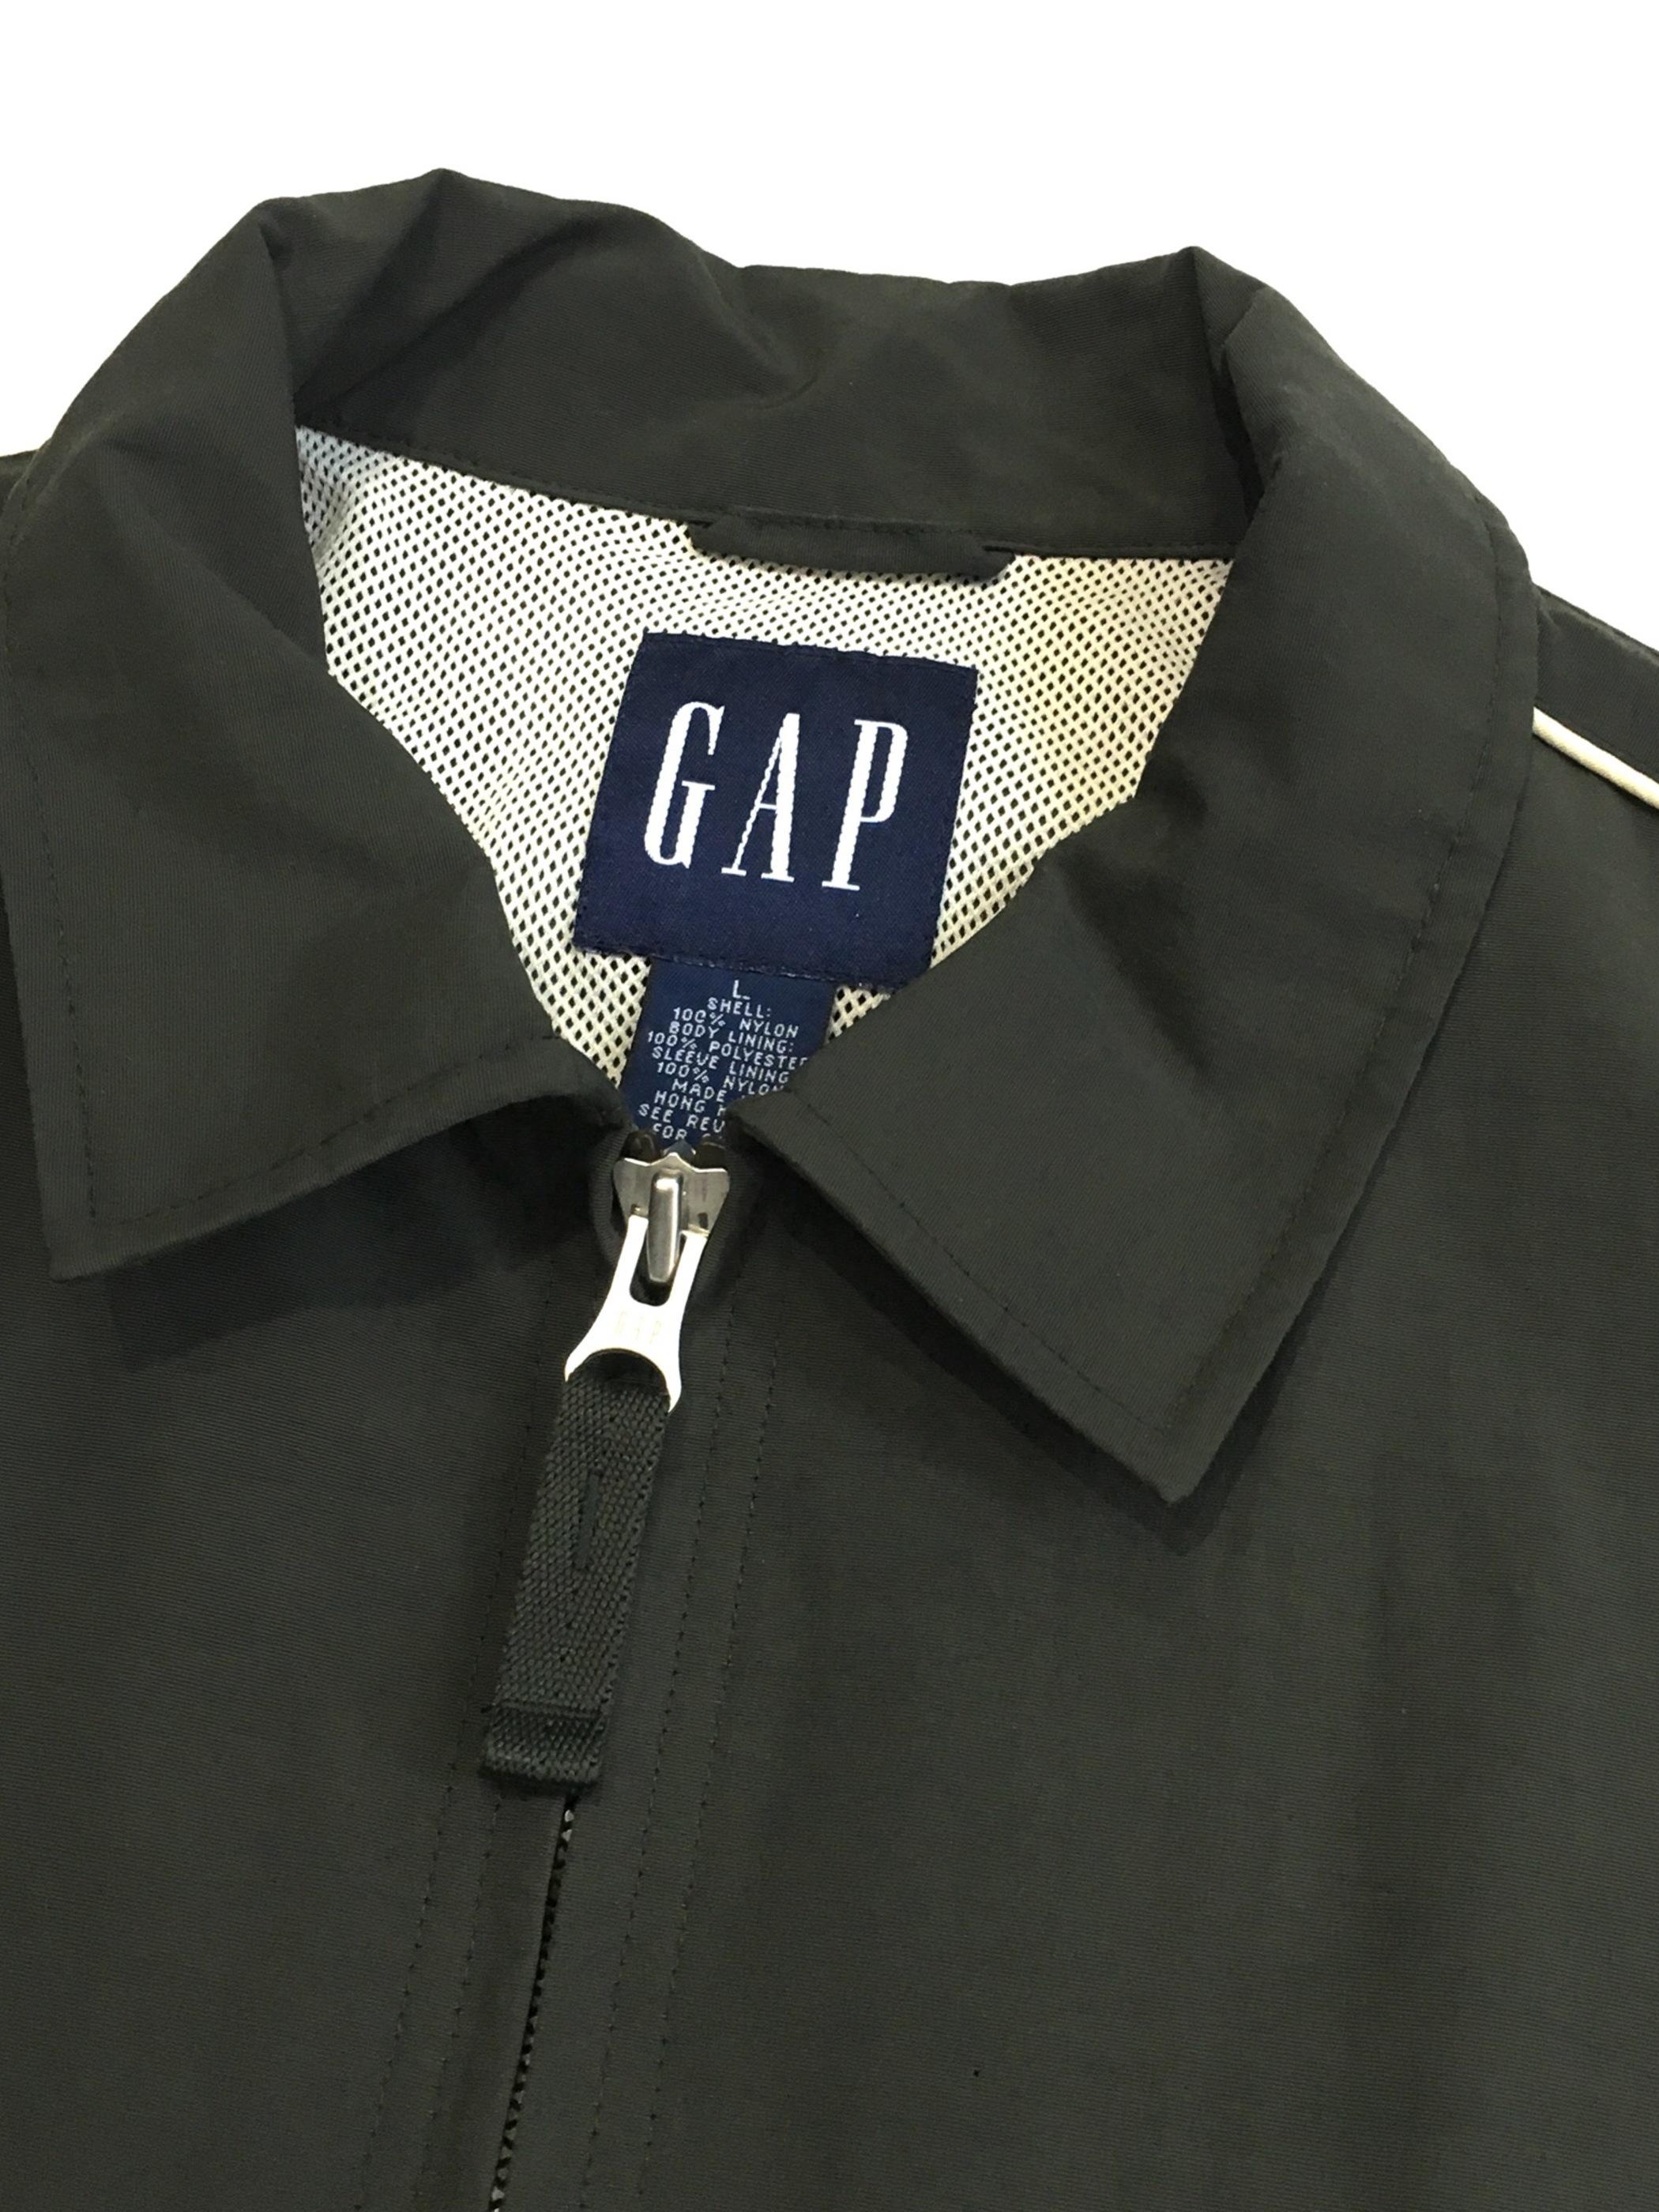 OLD GAP nylon jacket